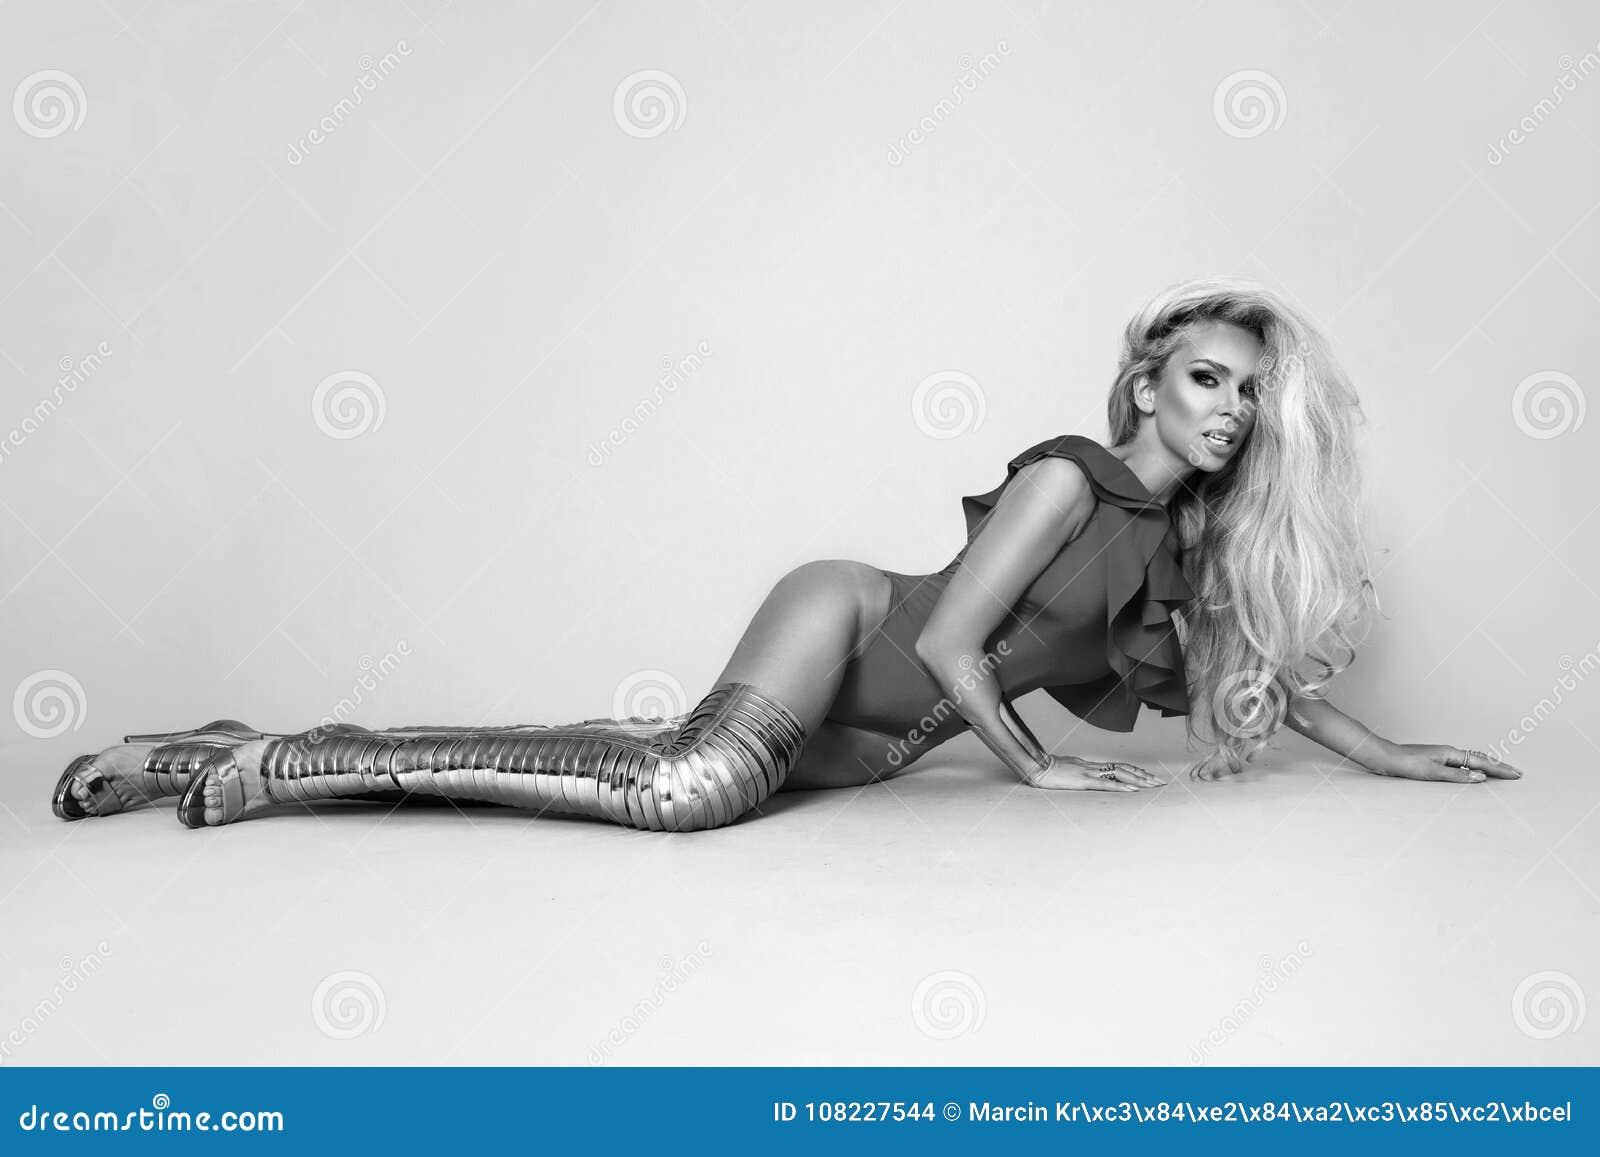 5e6f7c80b3c Elegant woman in bikini and amazing gold high heels shoes on a beige  background